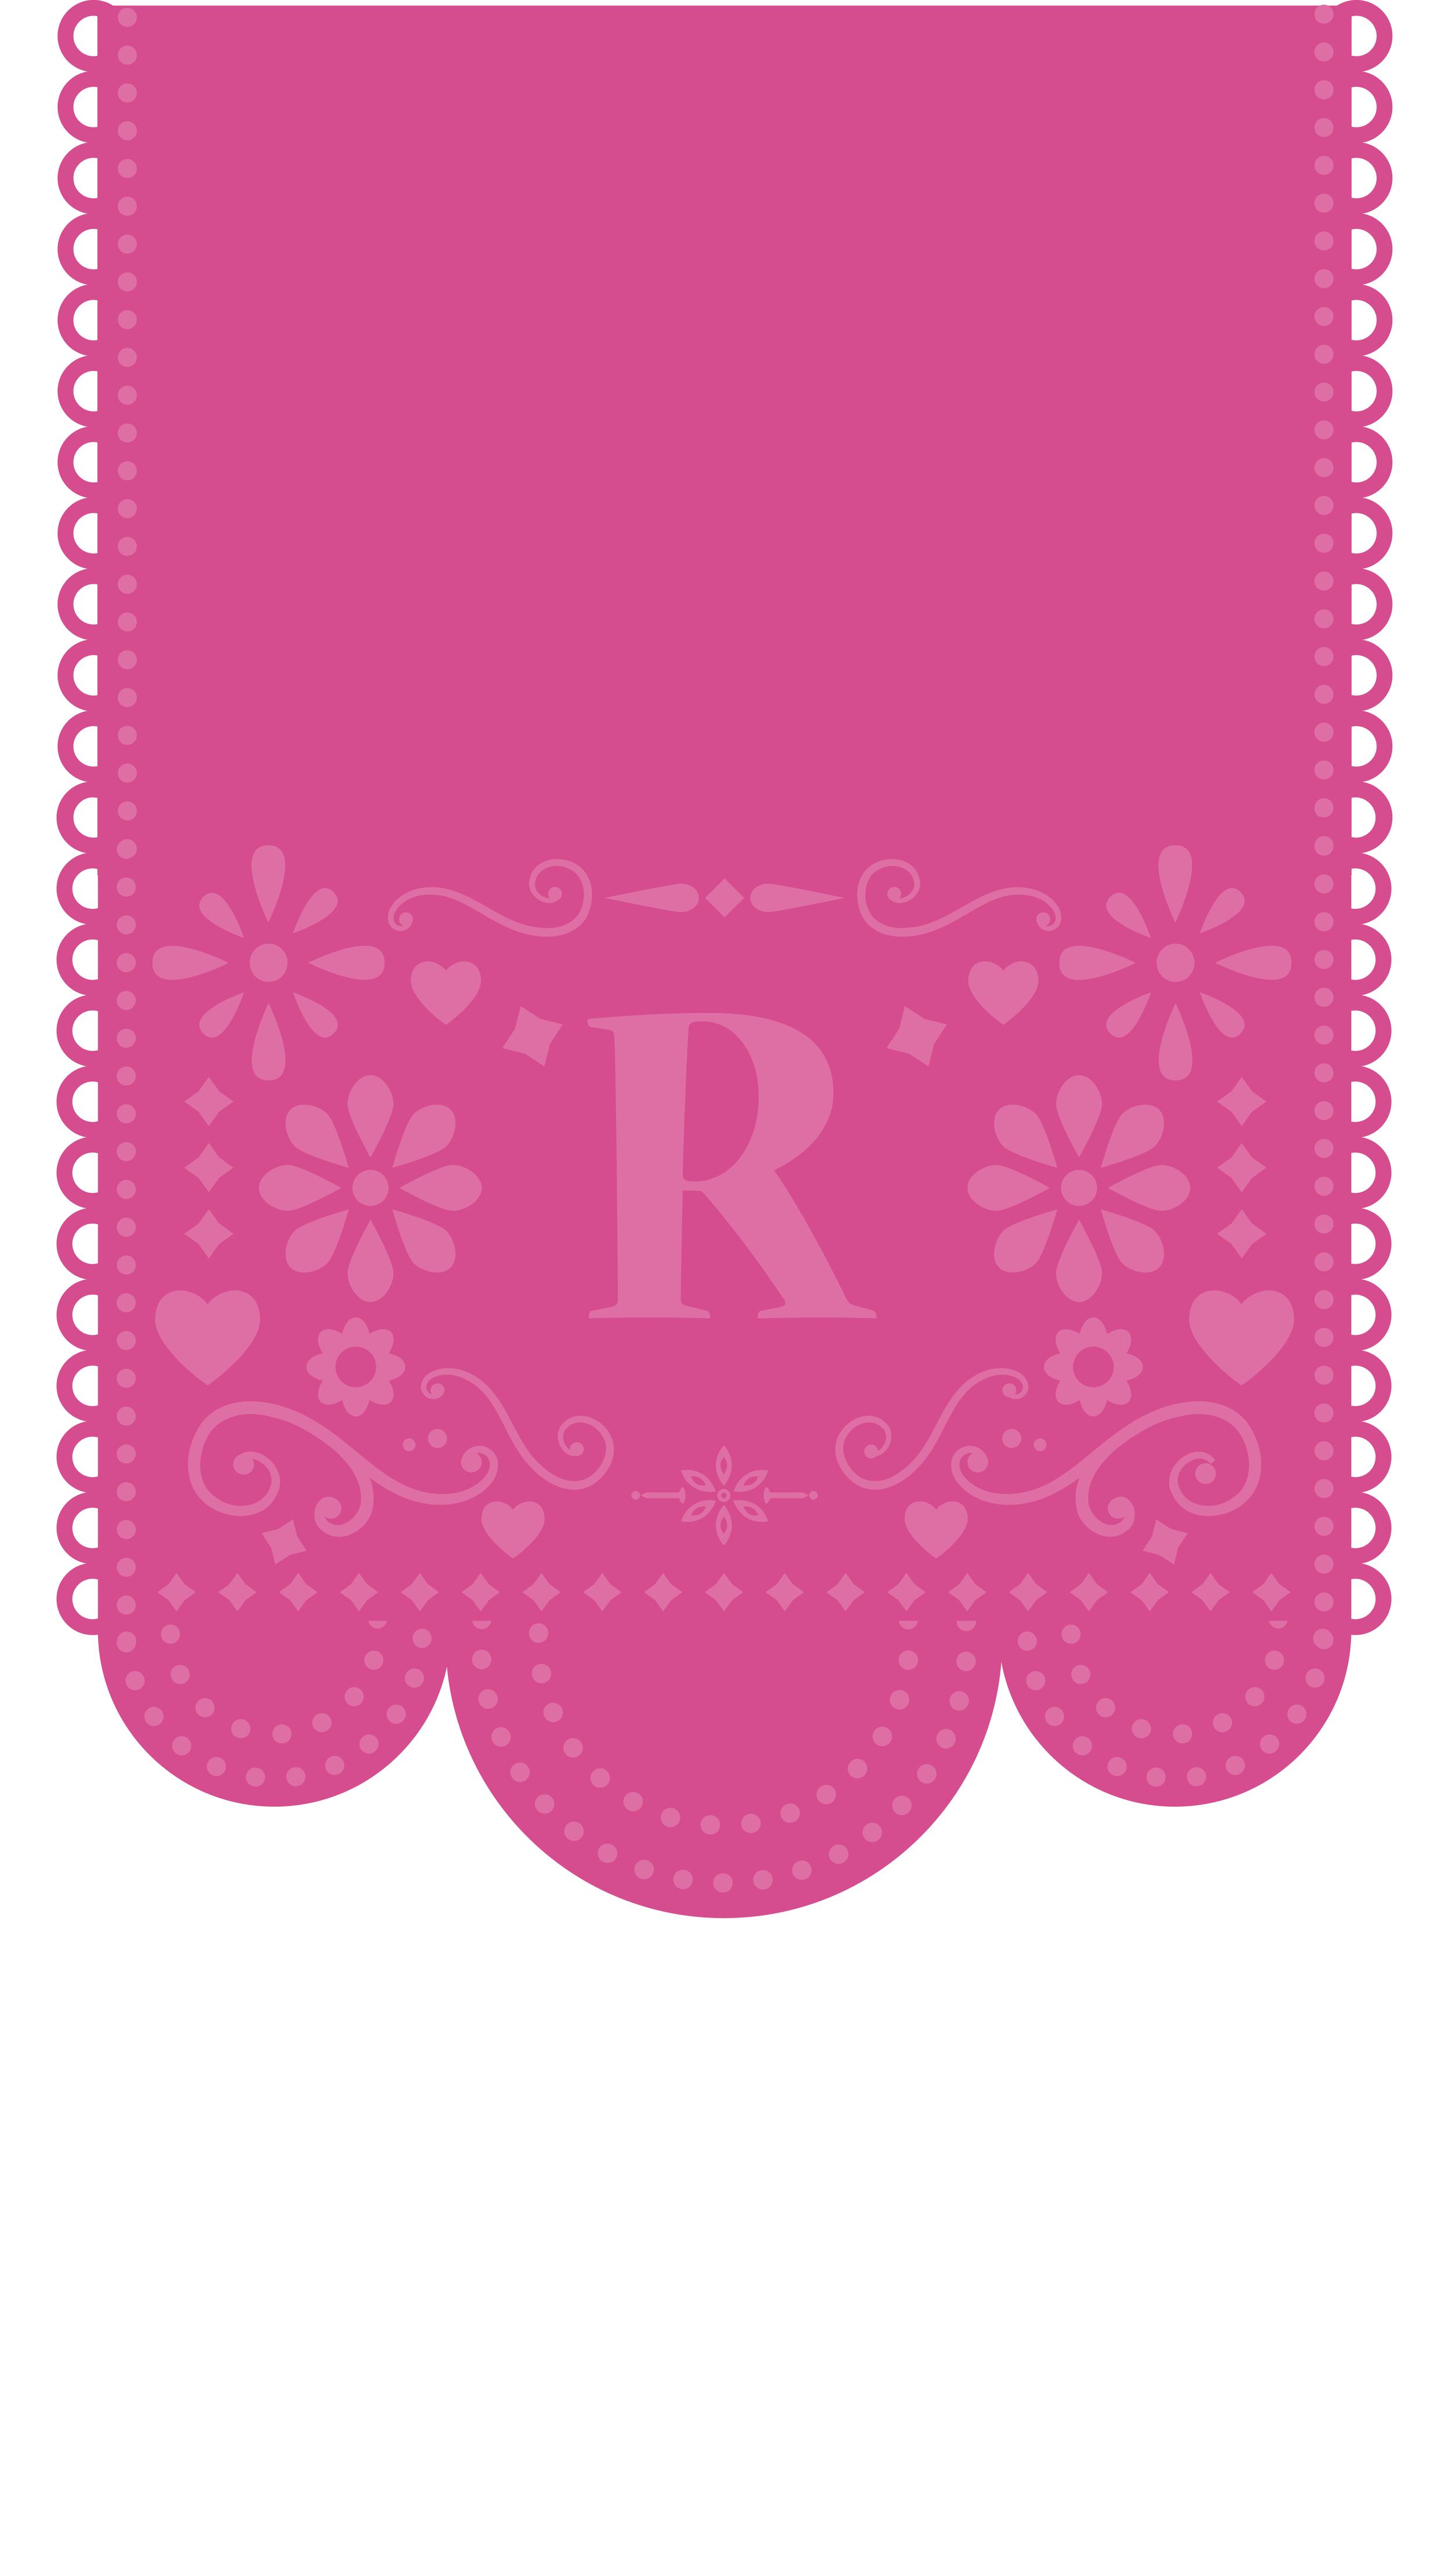 r-fiesta-banner.png